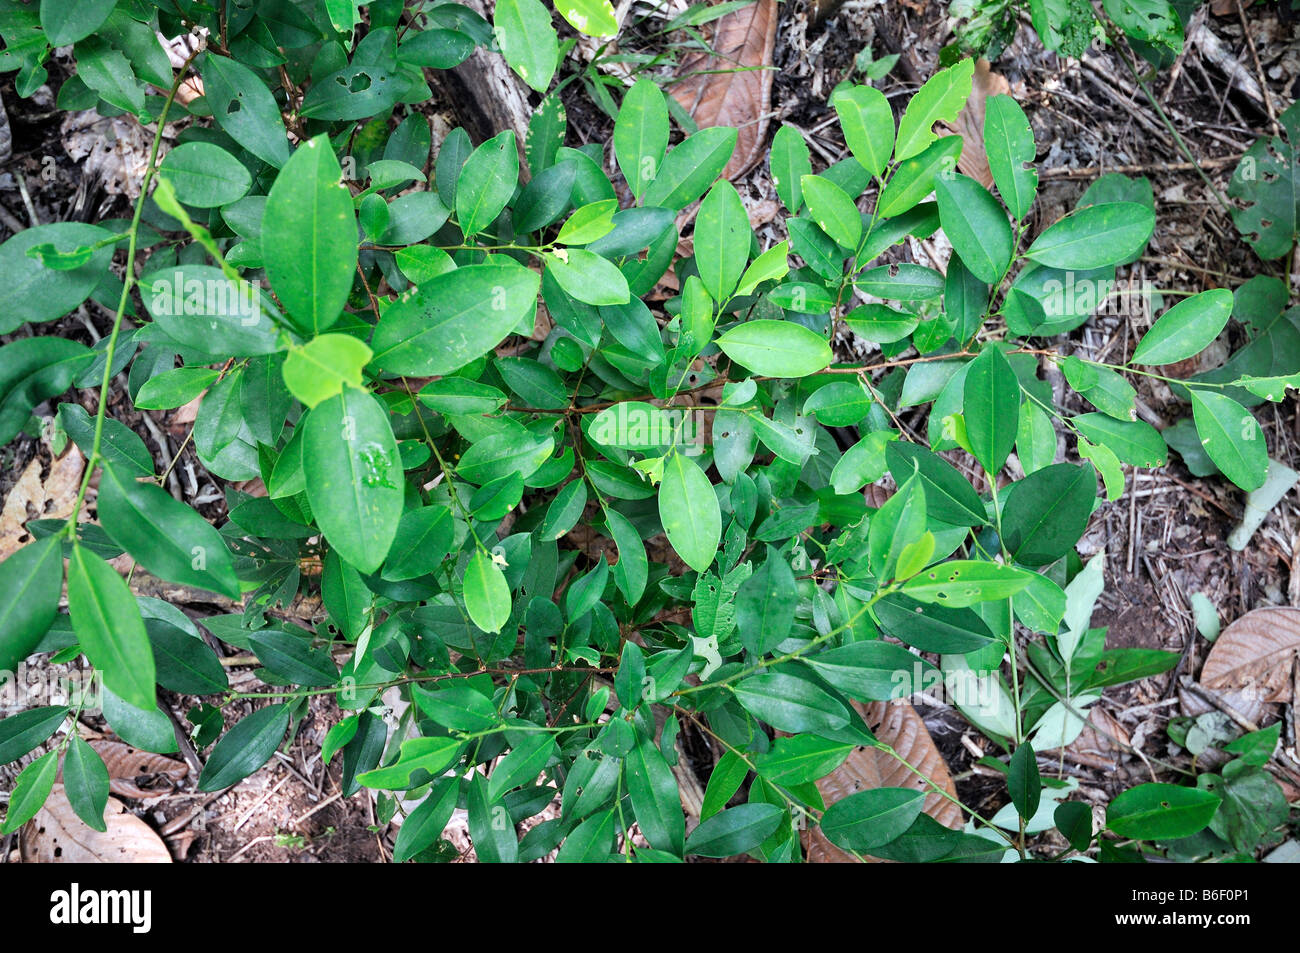 Coca plant cultivation, Bolivia, South America - Stock Image